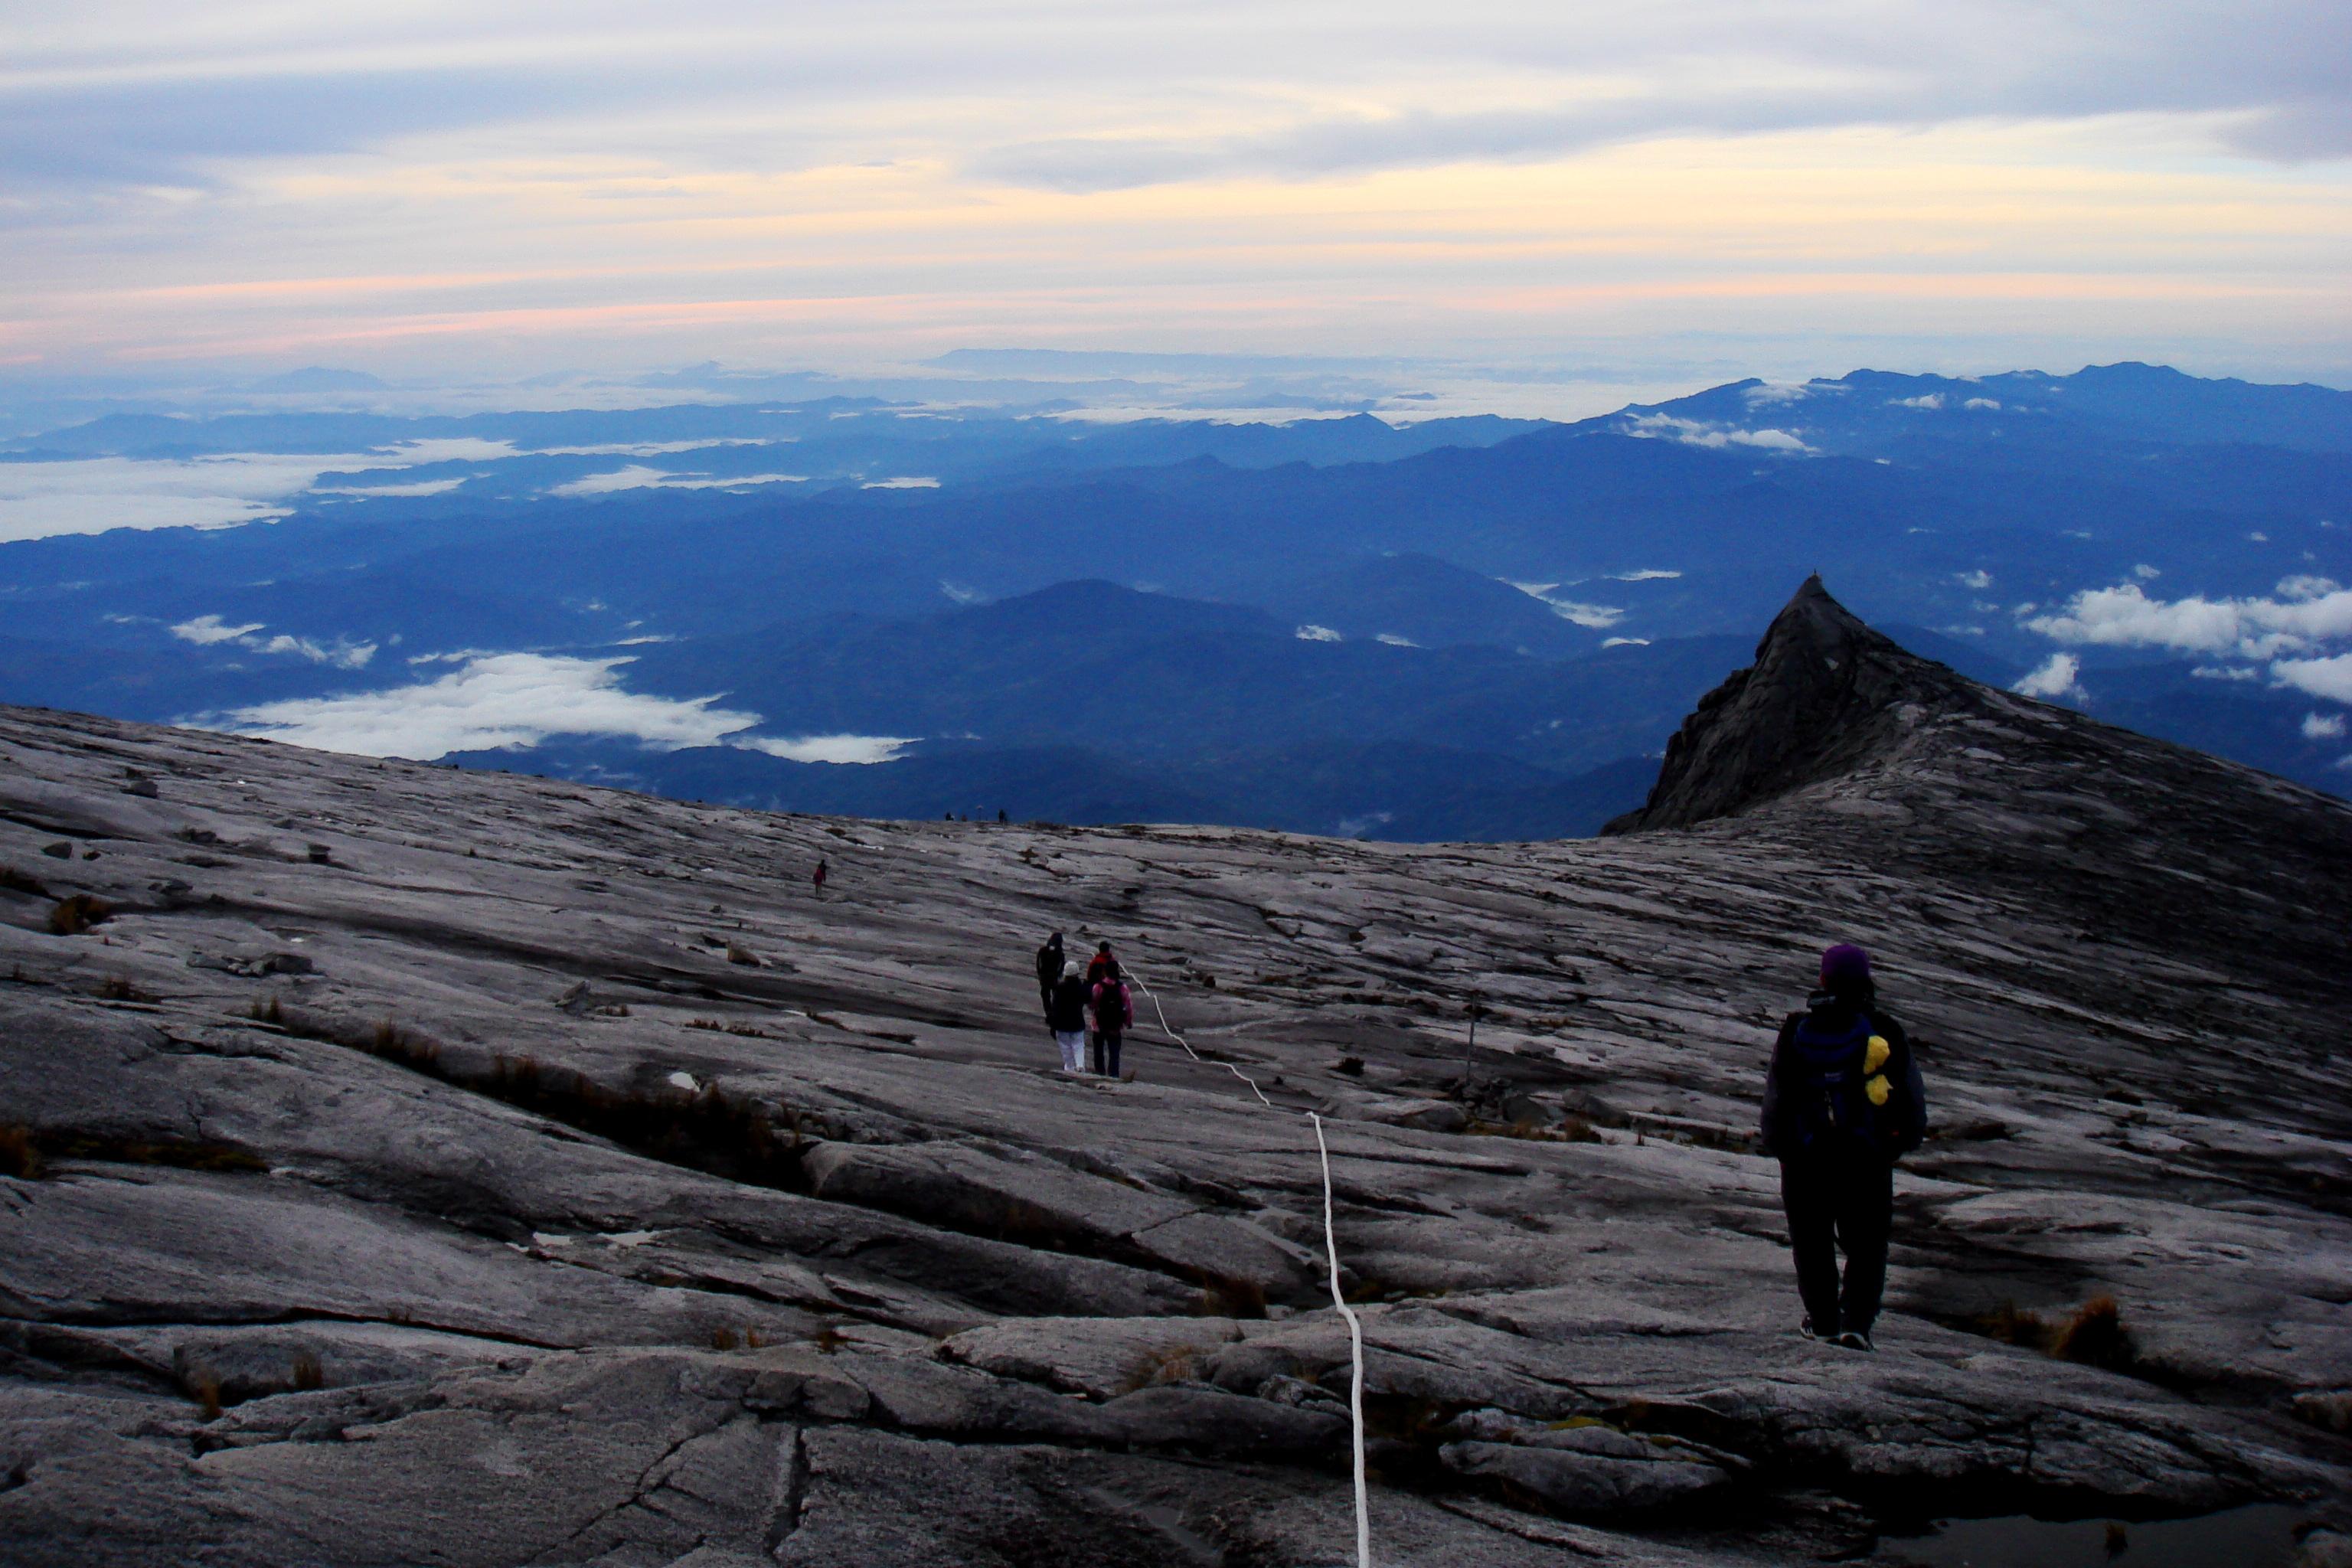 Le mont Kinabalu à Bornéo | Crédits photo -- Mathilde Tarif/ Le Journal International